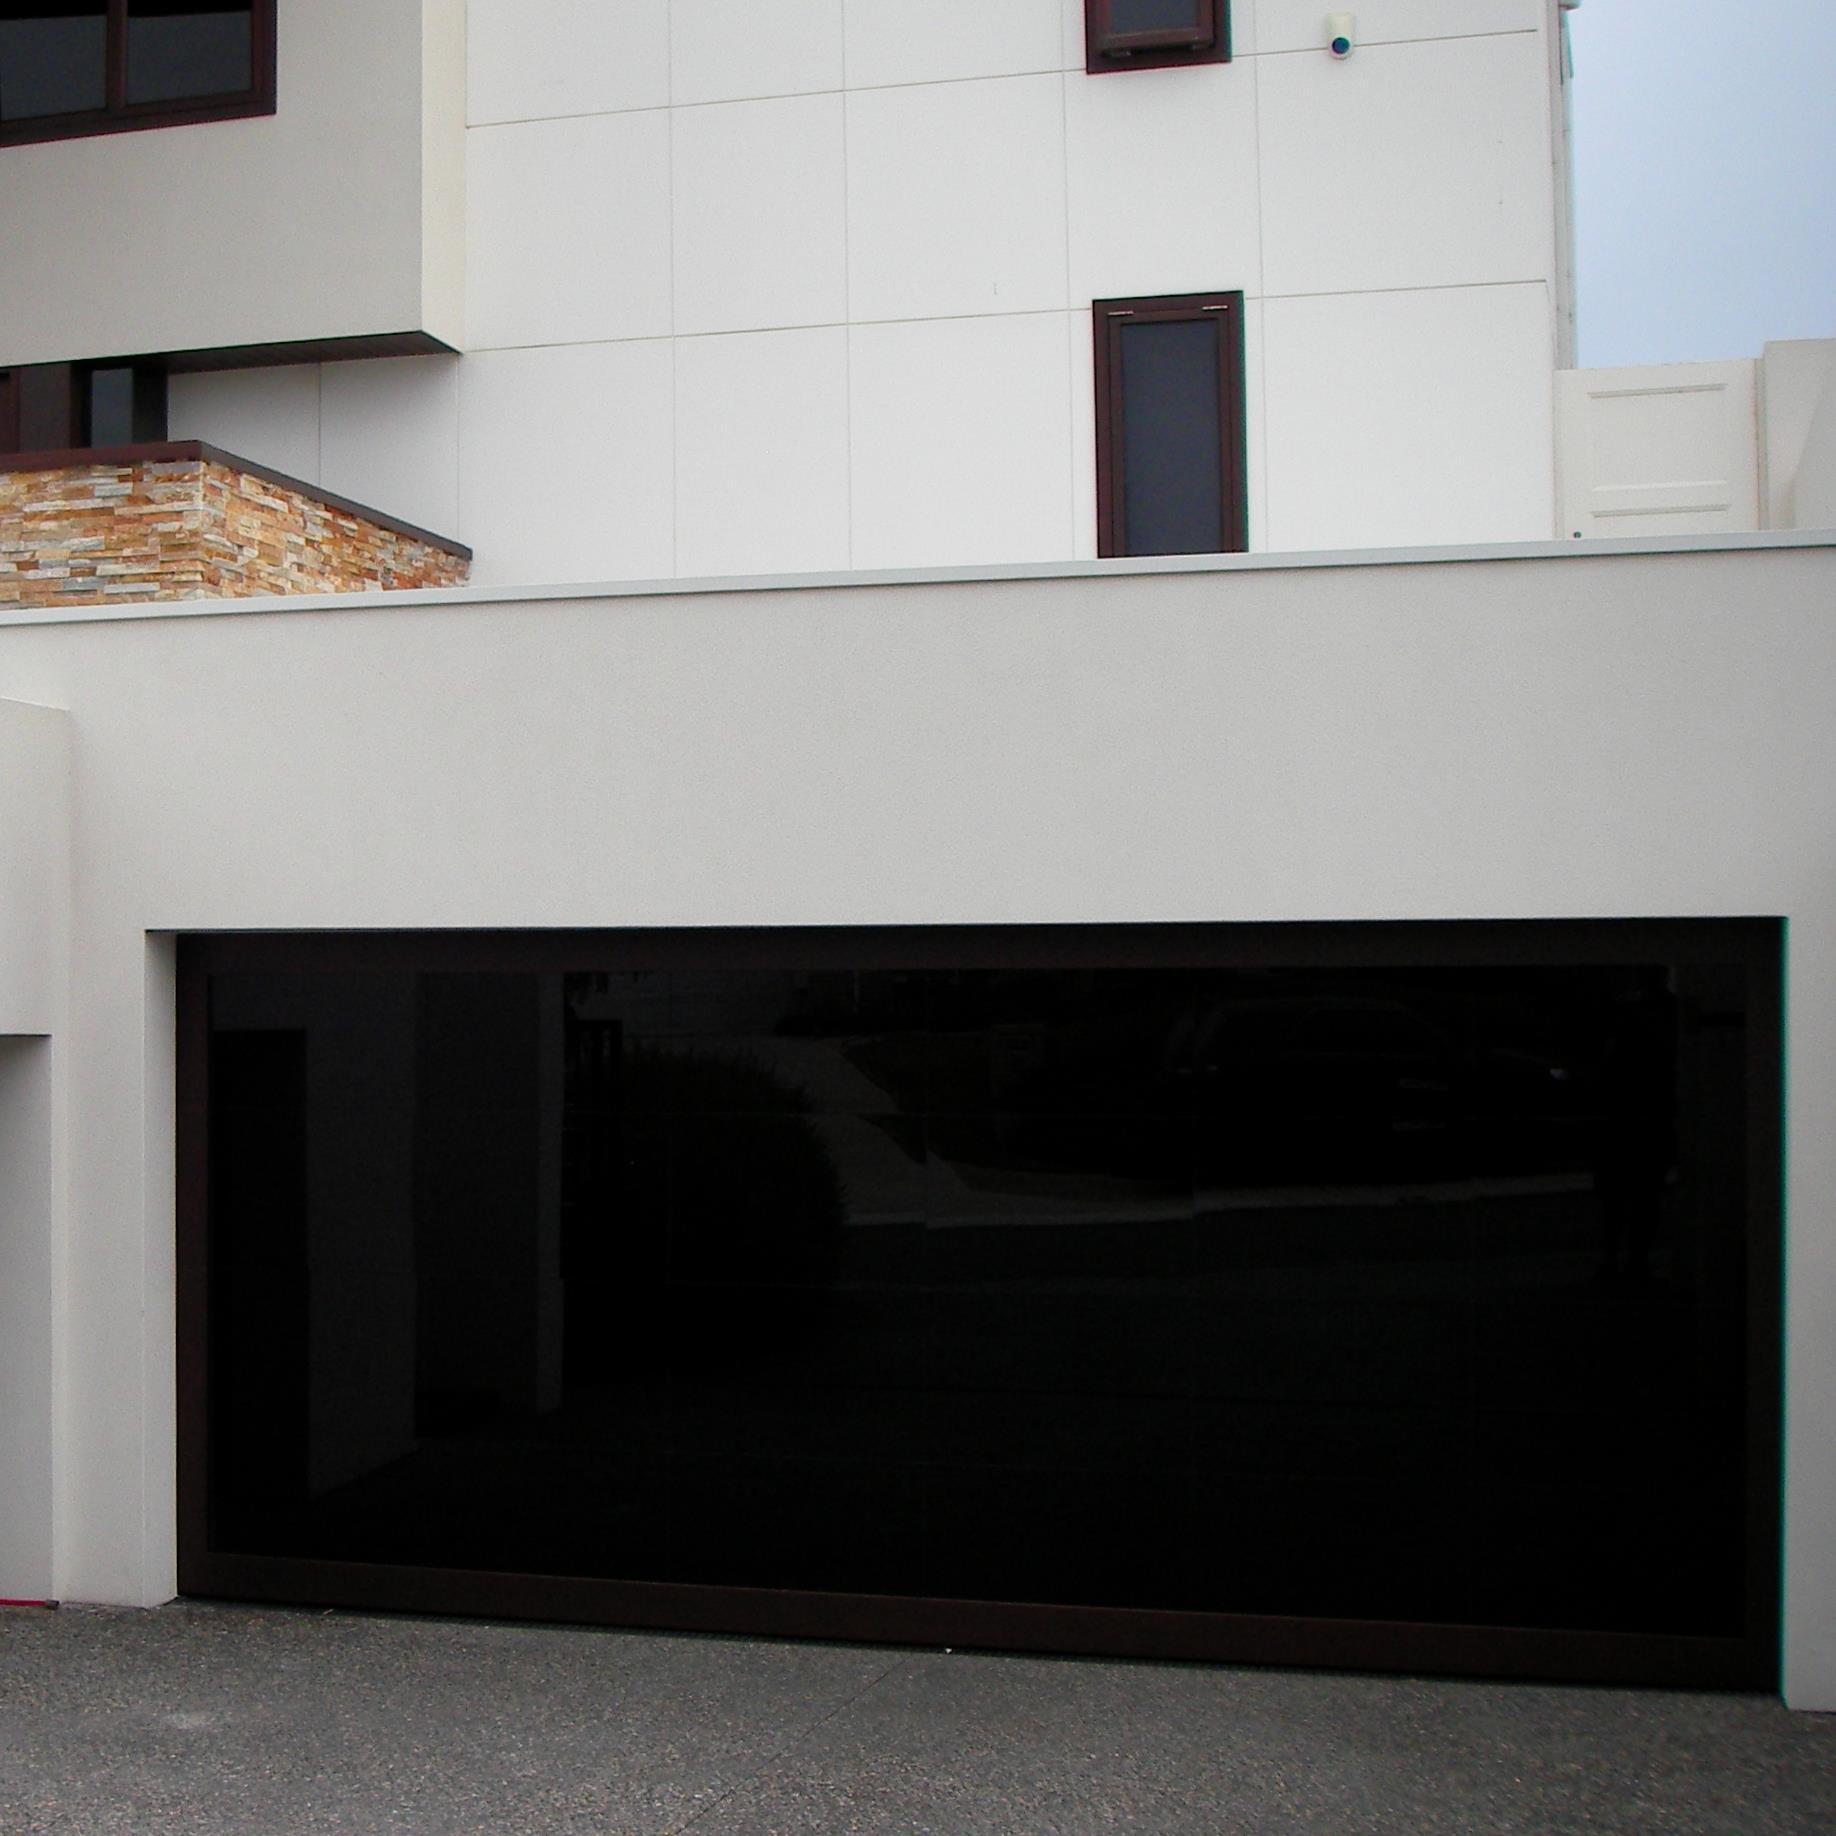 Danmar Garage Doors & Danmar Garage Doors (@Danmar_Doors) | Twitter